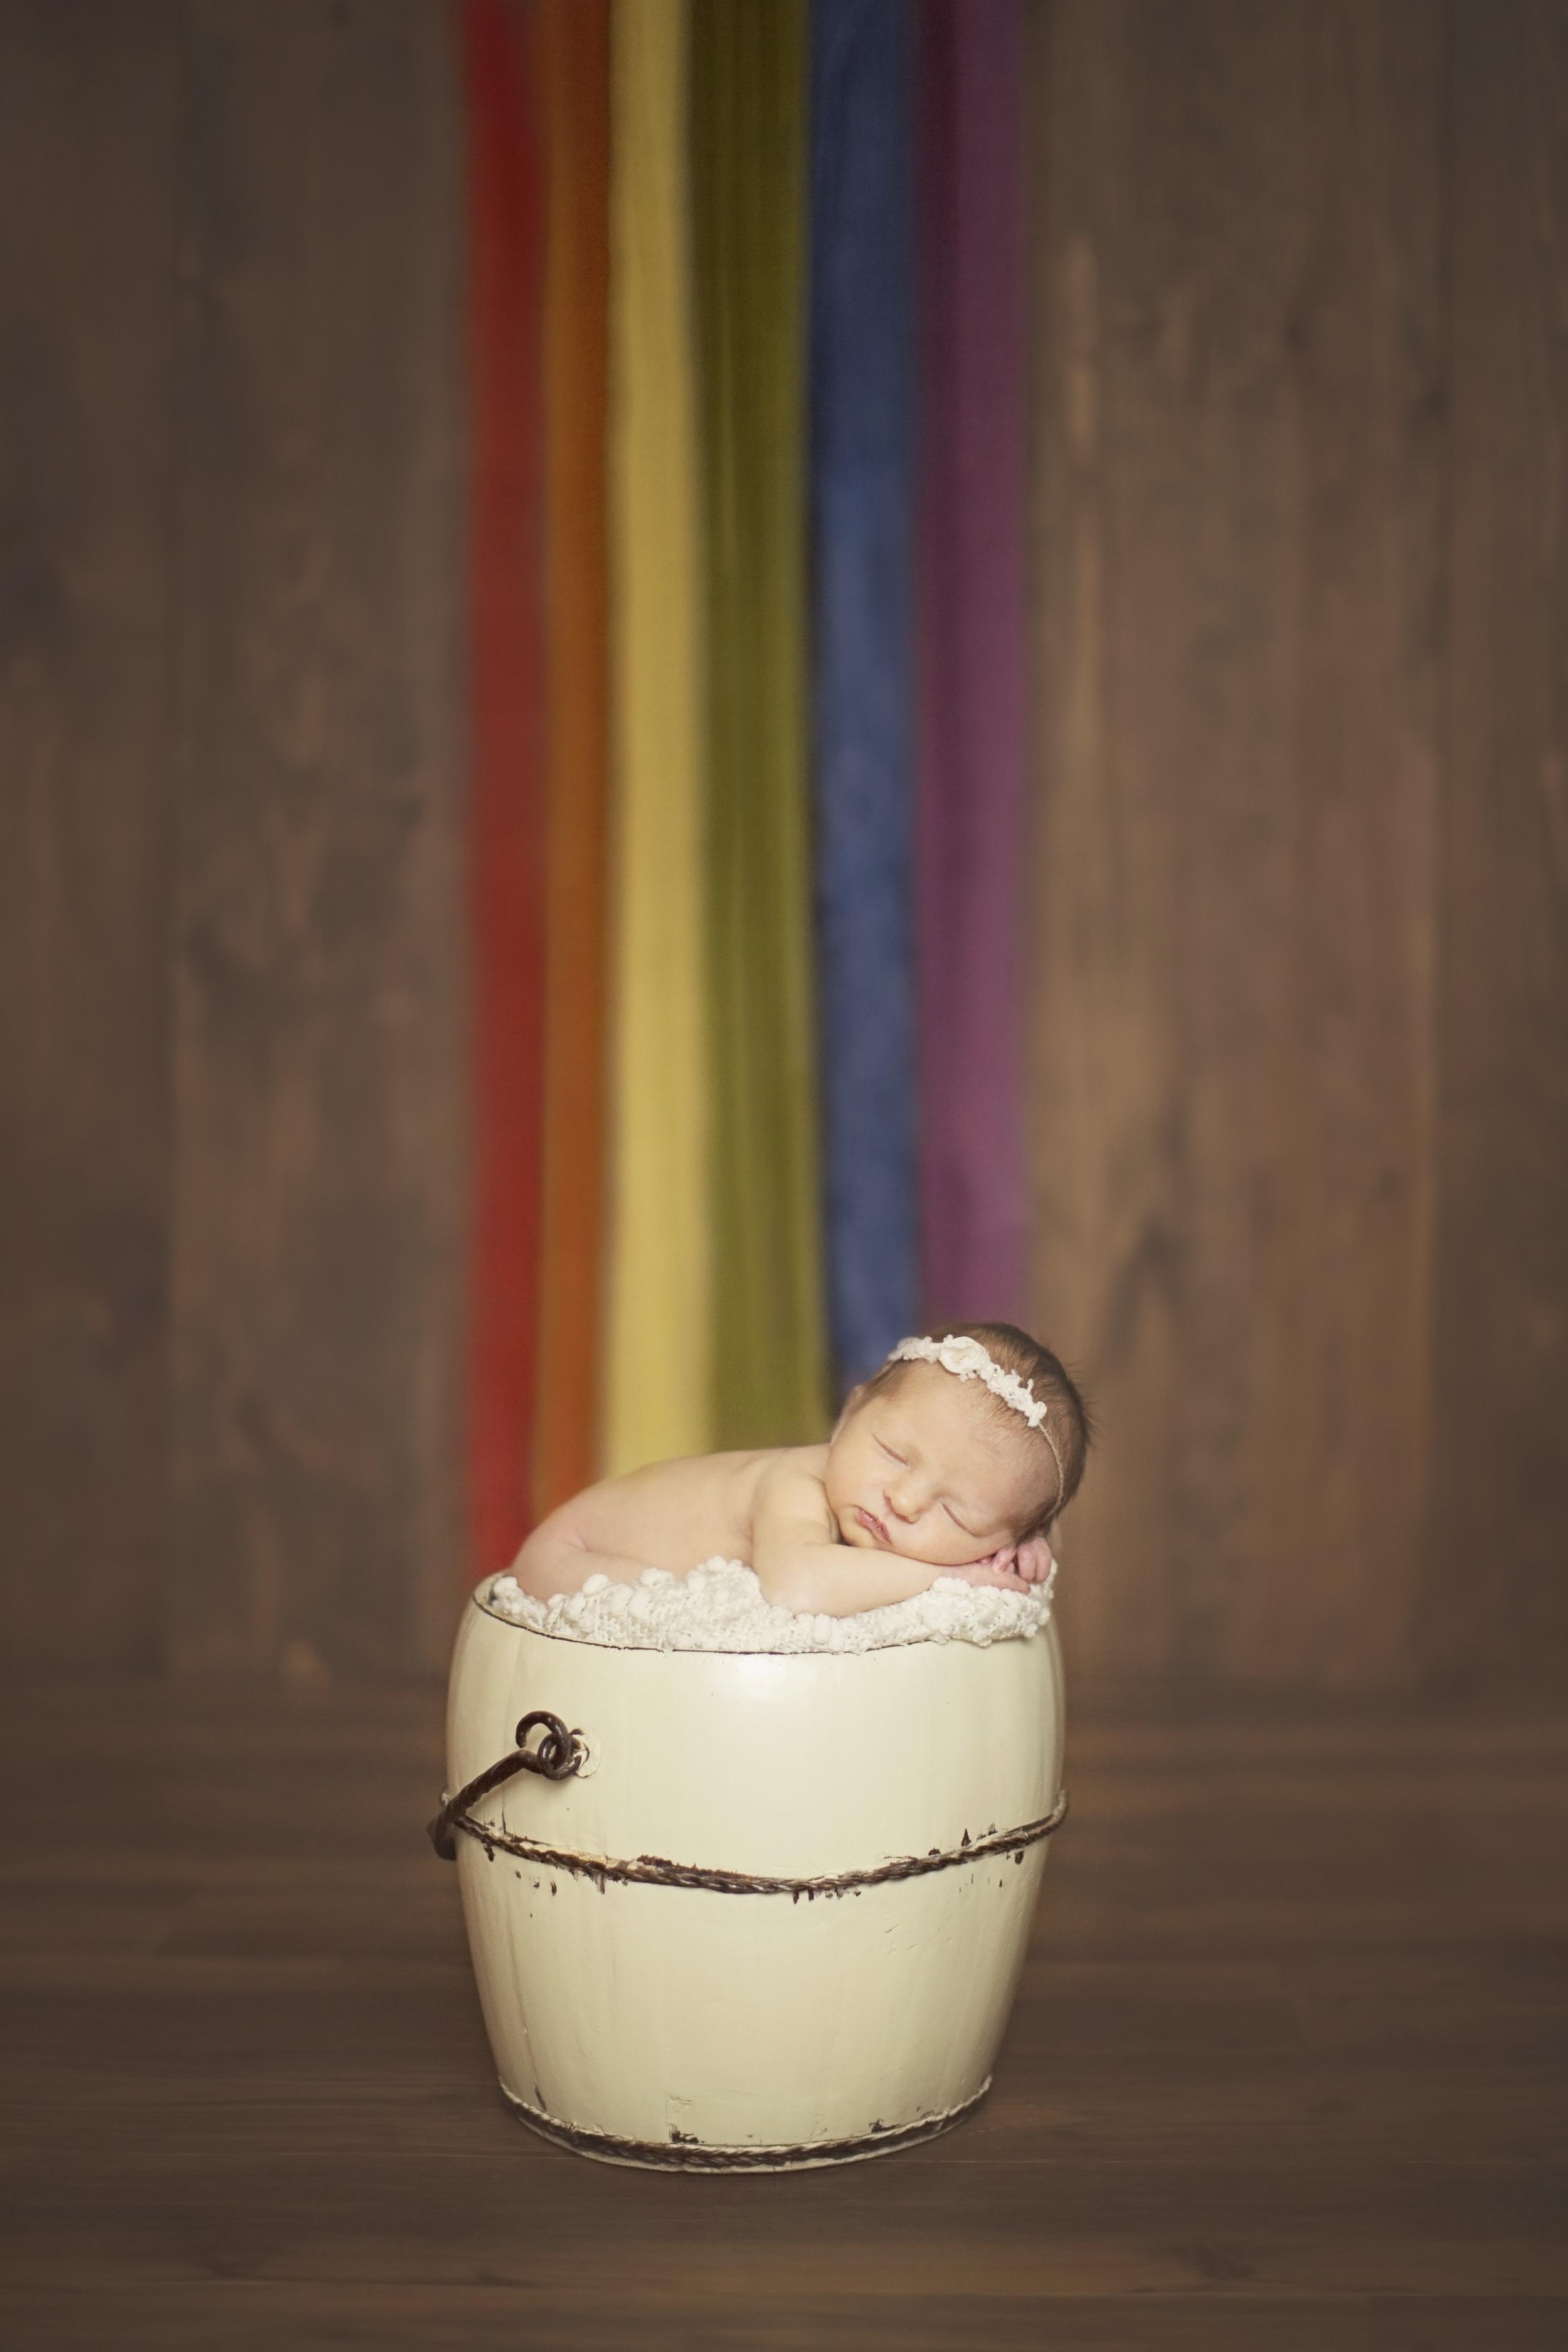 pulaski NY newborn photography